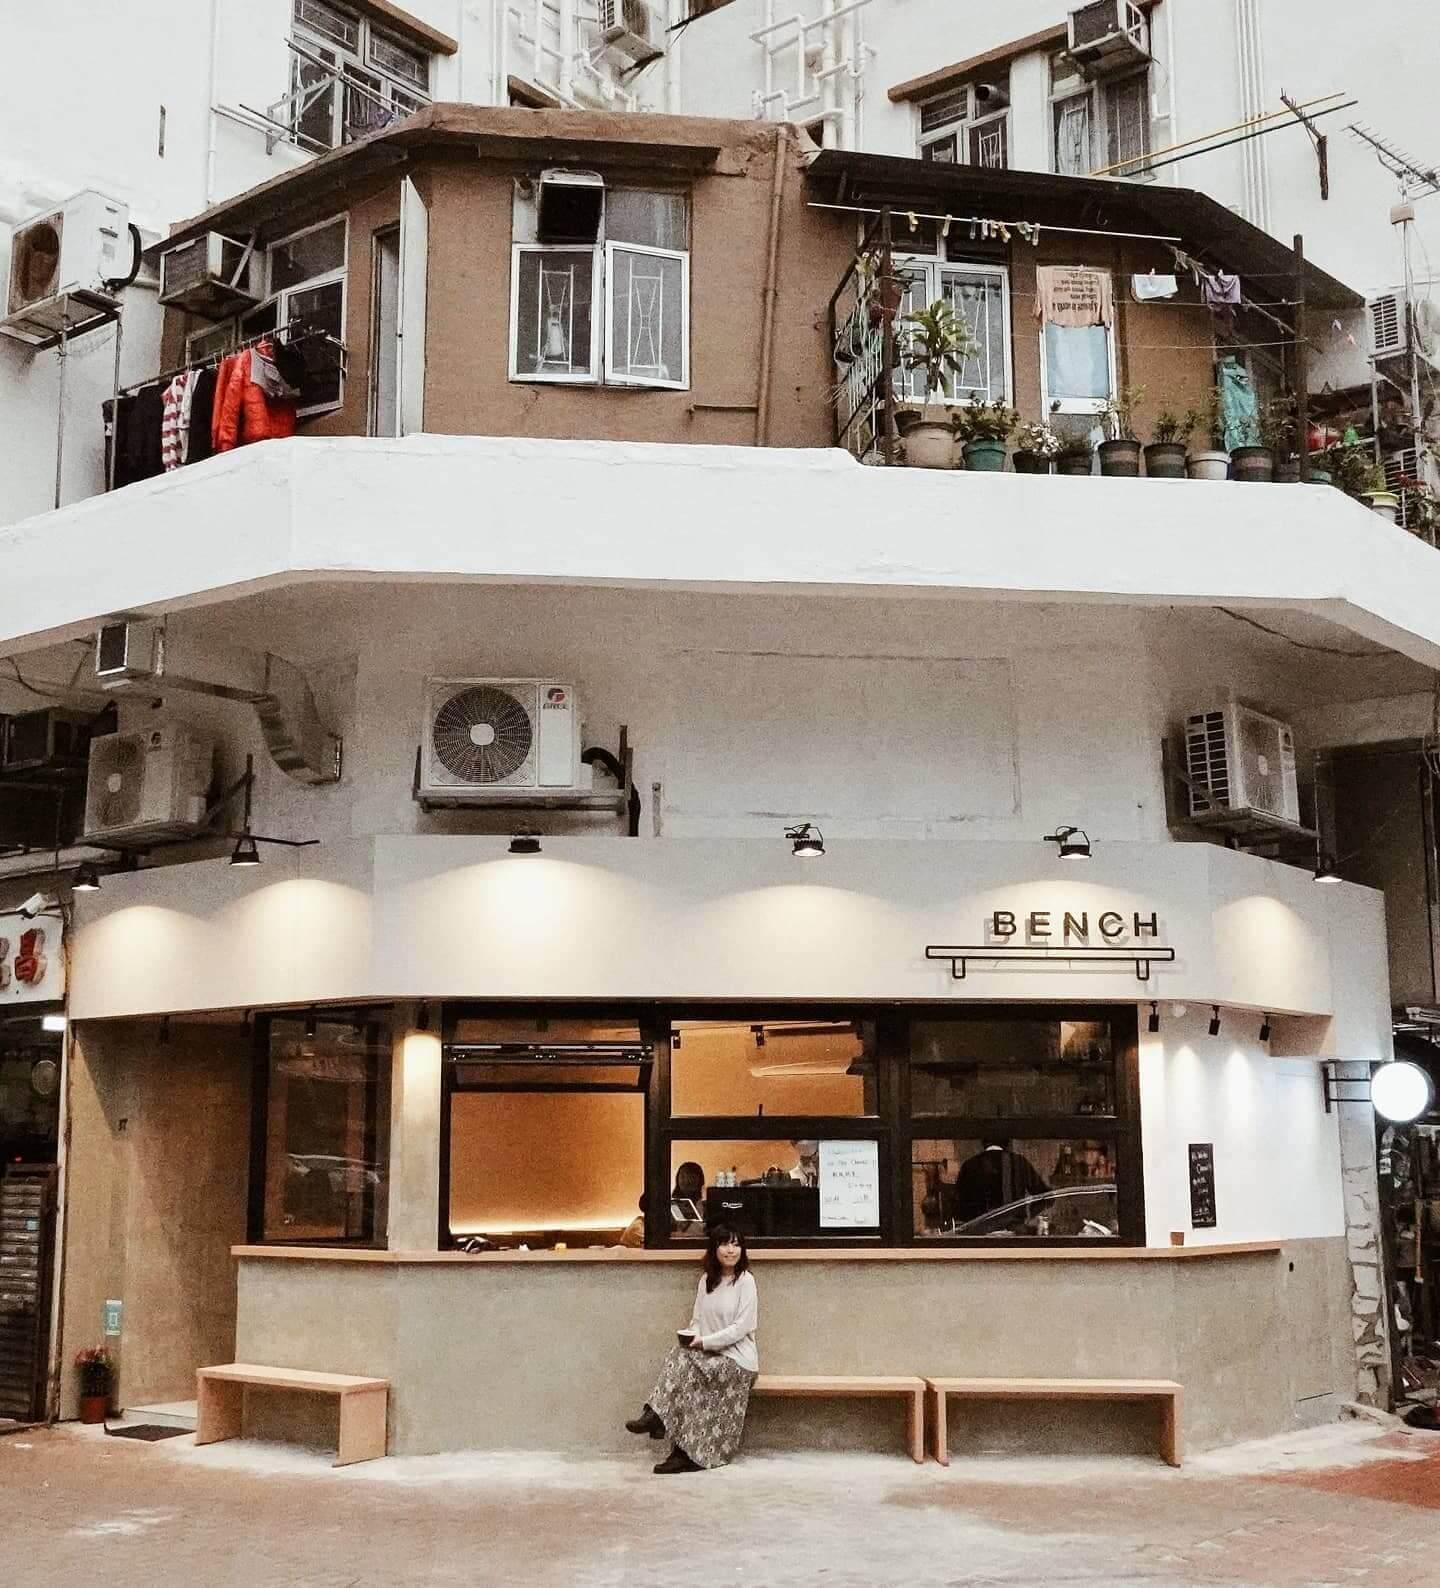 bench cafe位於芙蓉街,鄰近南豐紗廠,又係一個文青好去處。